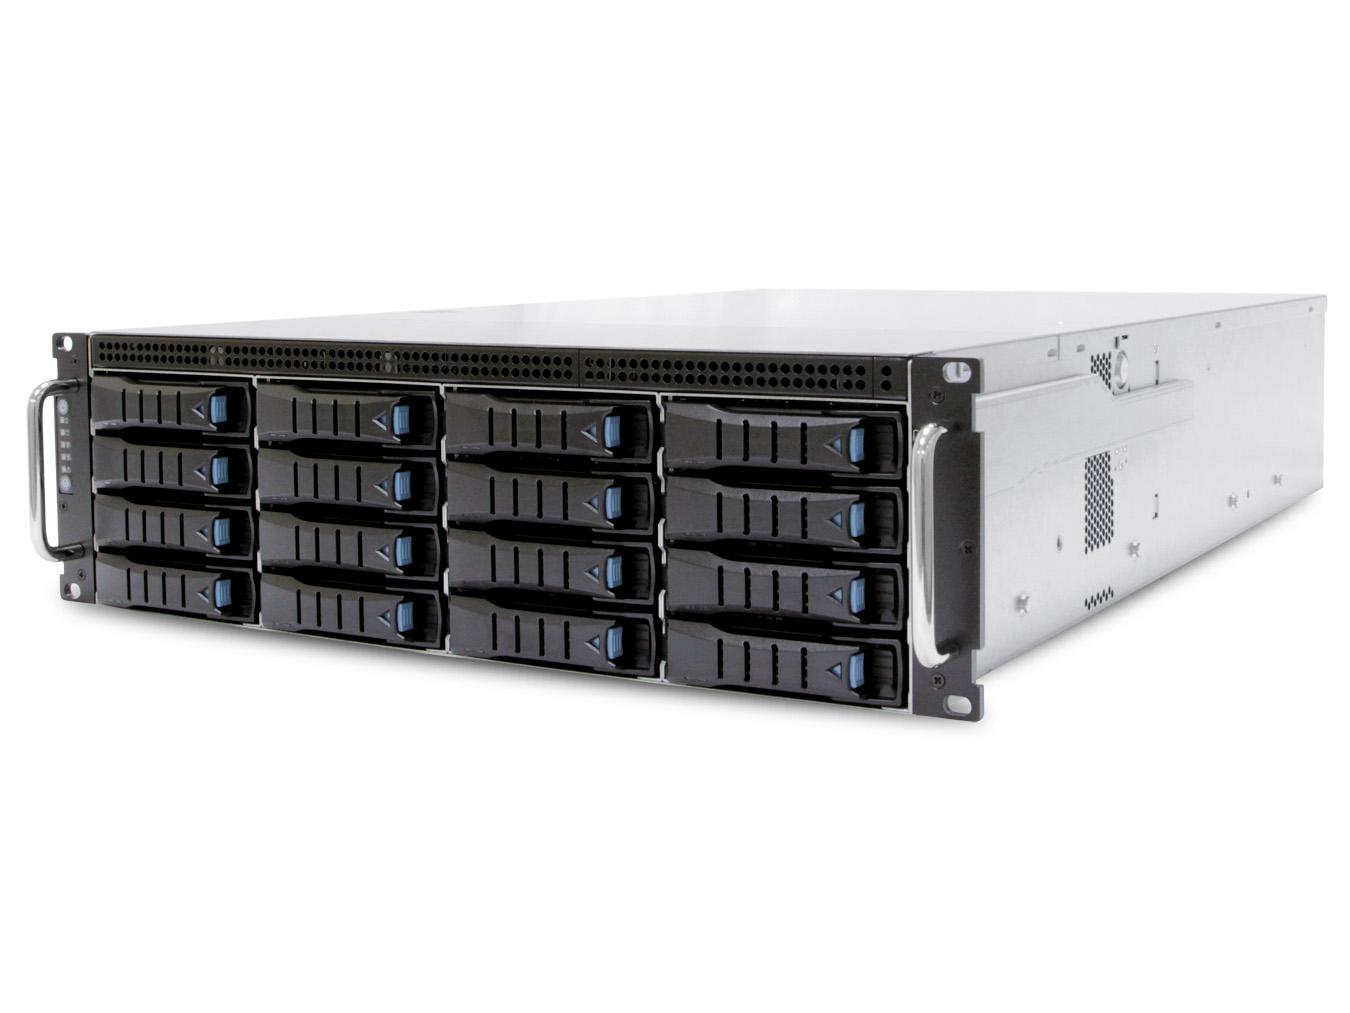 AIC SB302-LB XP1-S302LB01 3U 16-Bay Storage Server